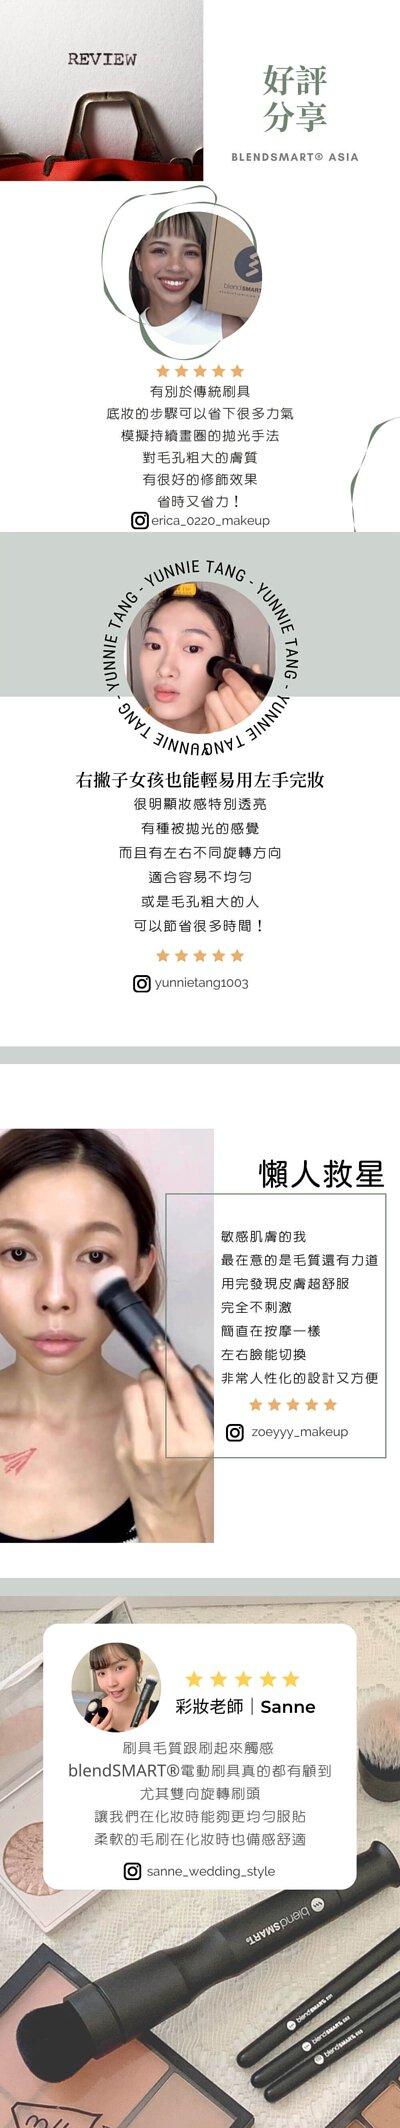 blendSMART® Asia 電動化妝刷好評不斷,只是換了刷具,妝感就不一樣了